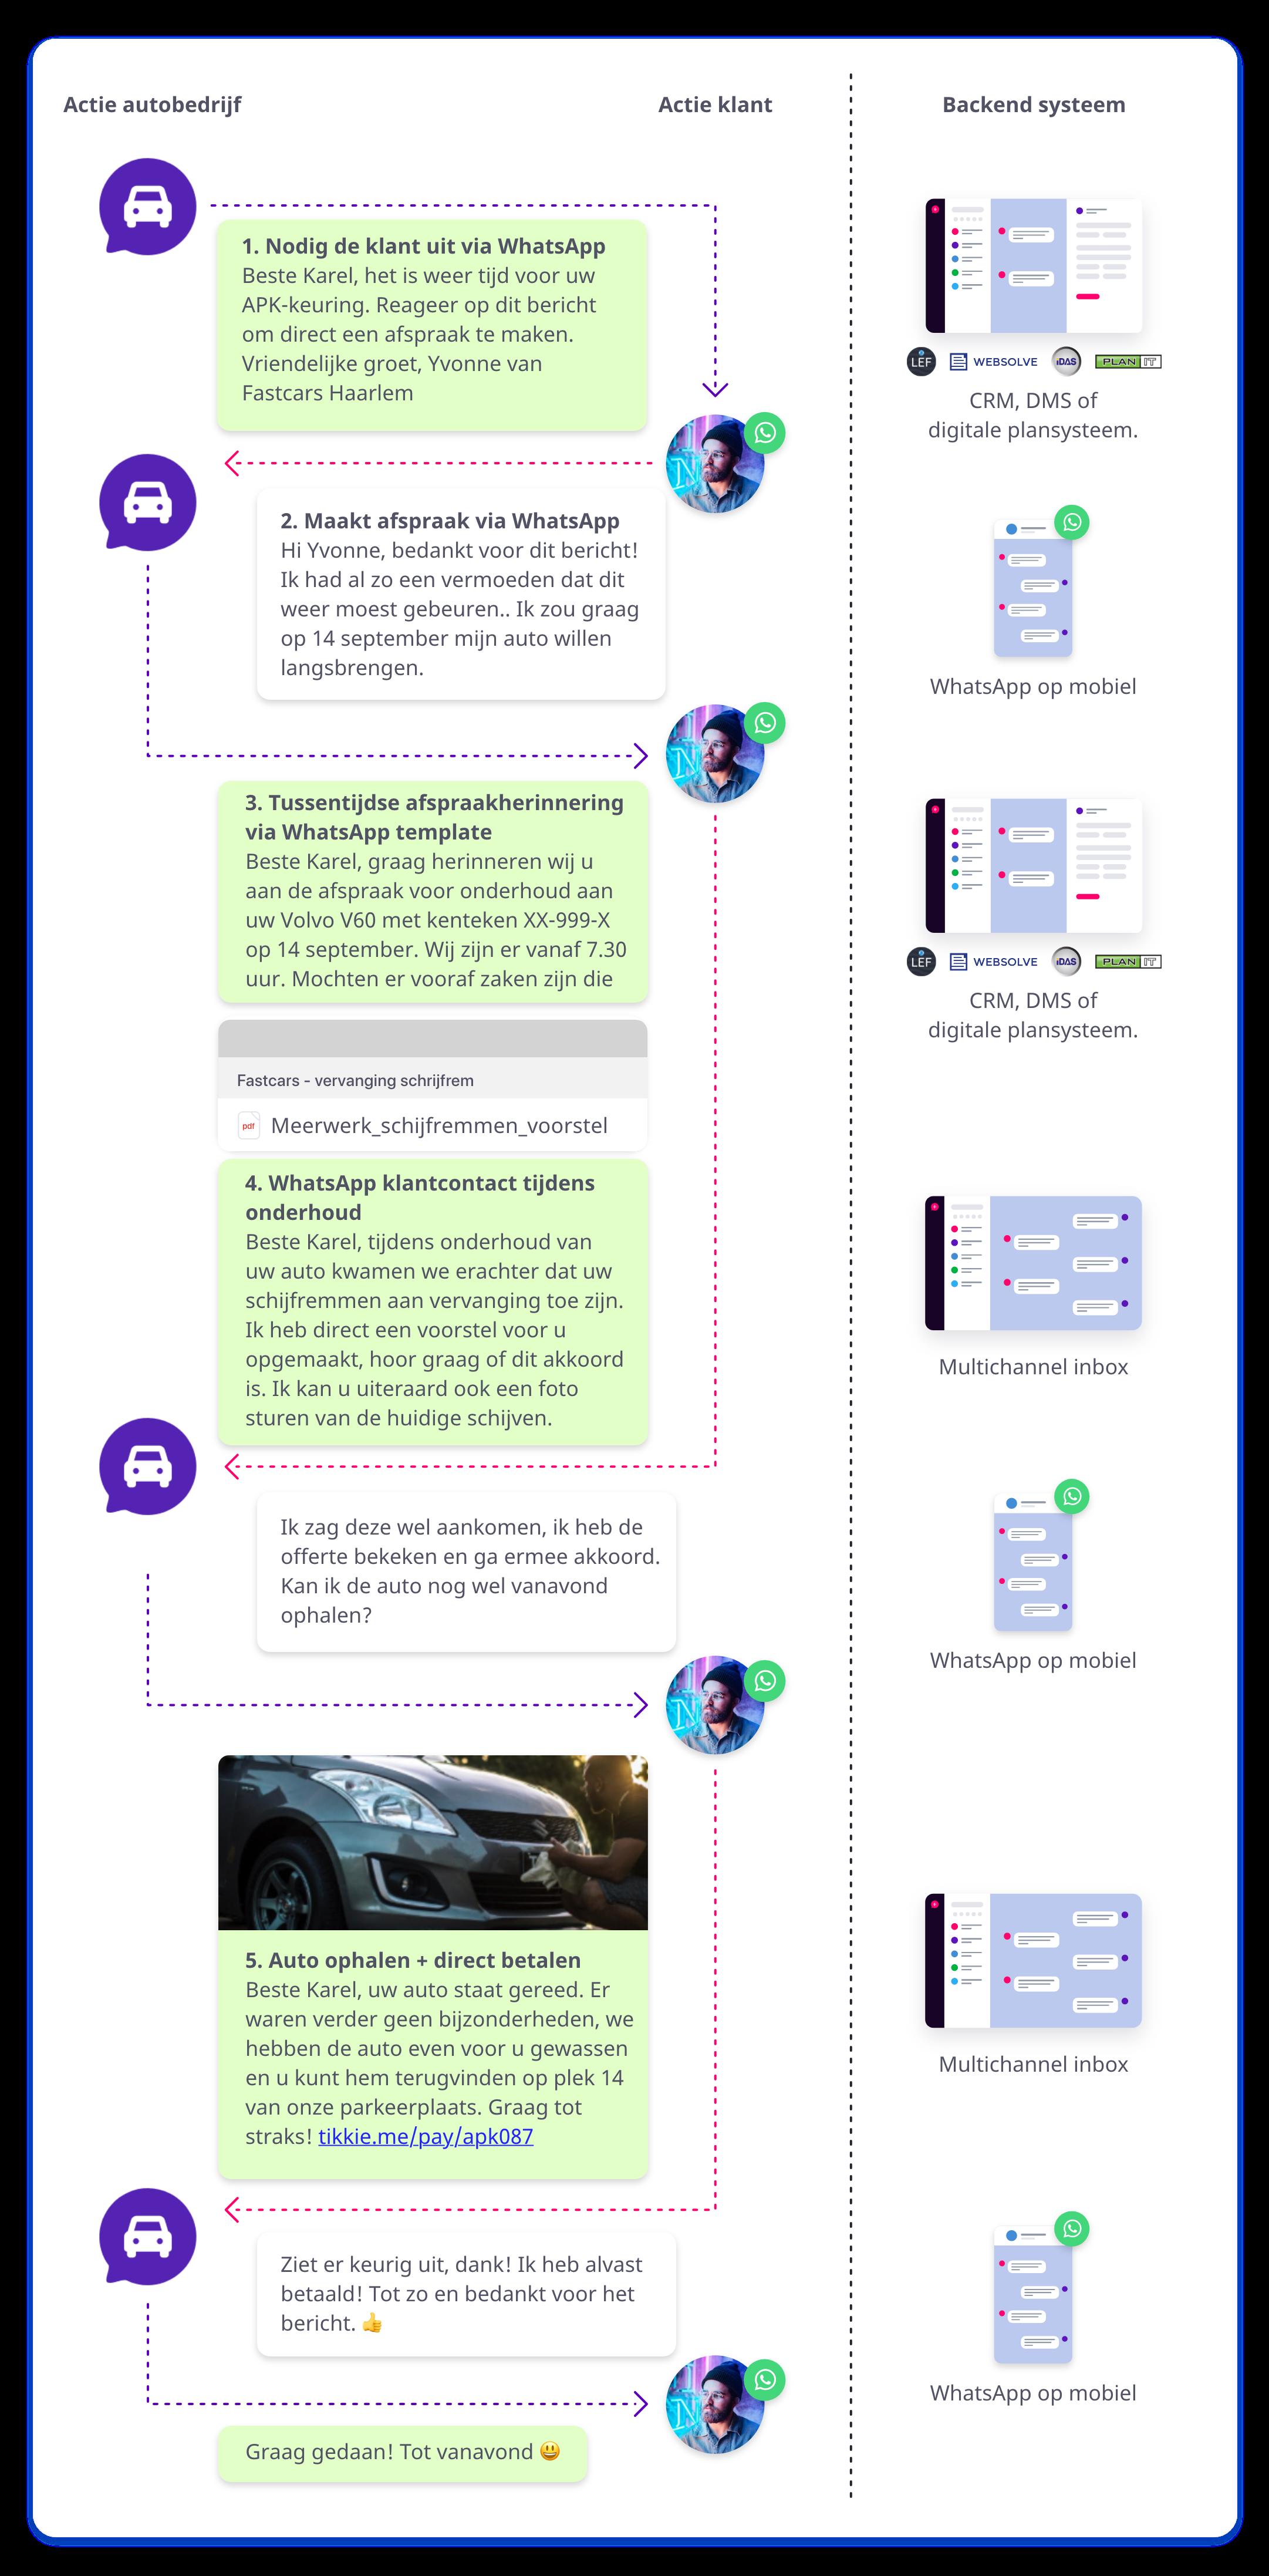 WhatsApp automotive - werkplaats gespreksflow